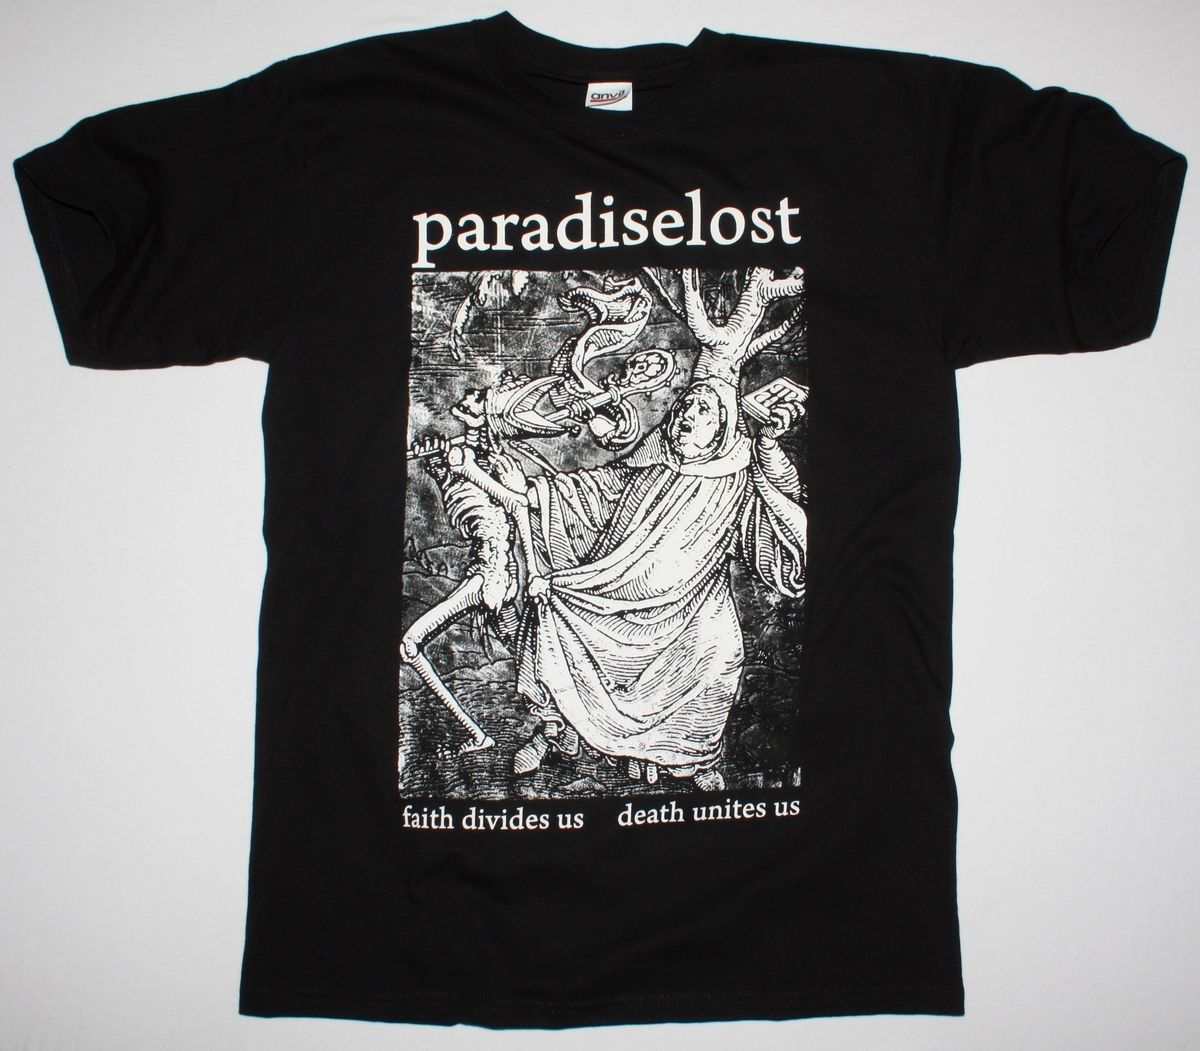 PARADISE LOST FAITH DIVIDES US DEATH UNITES US BLACK T SHIRT DOOM GOTHIC METAL